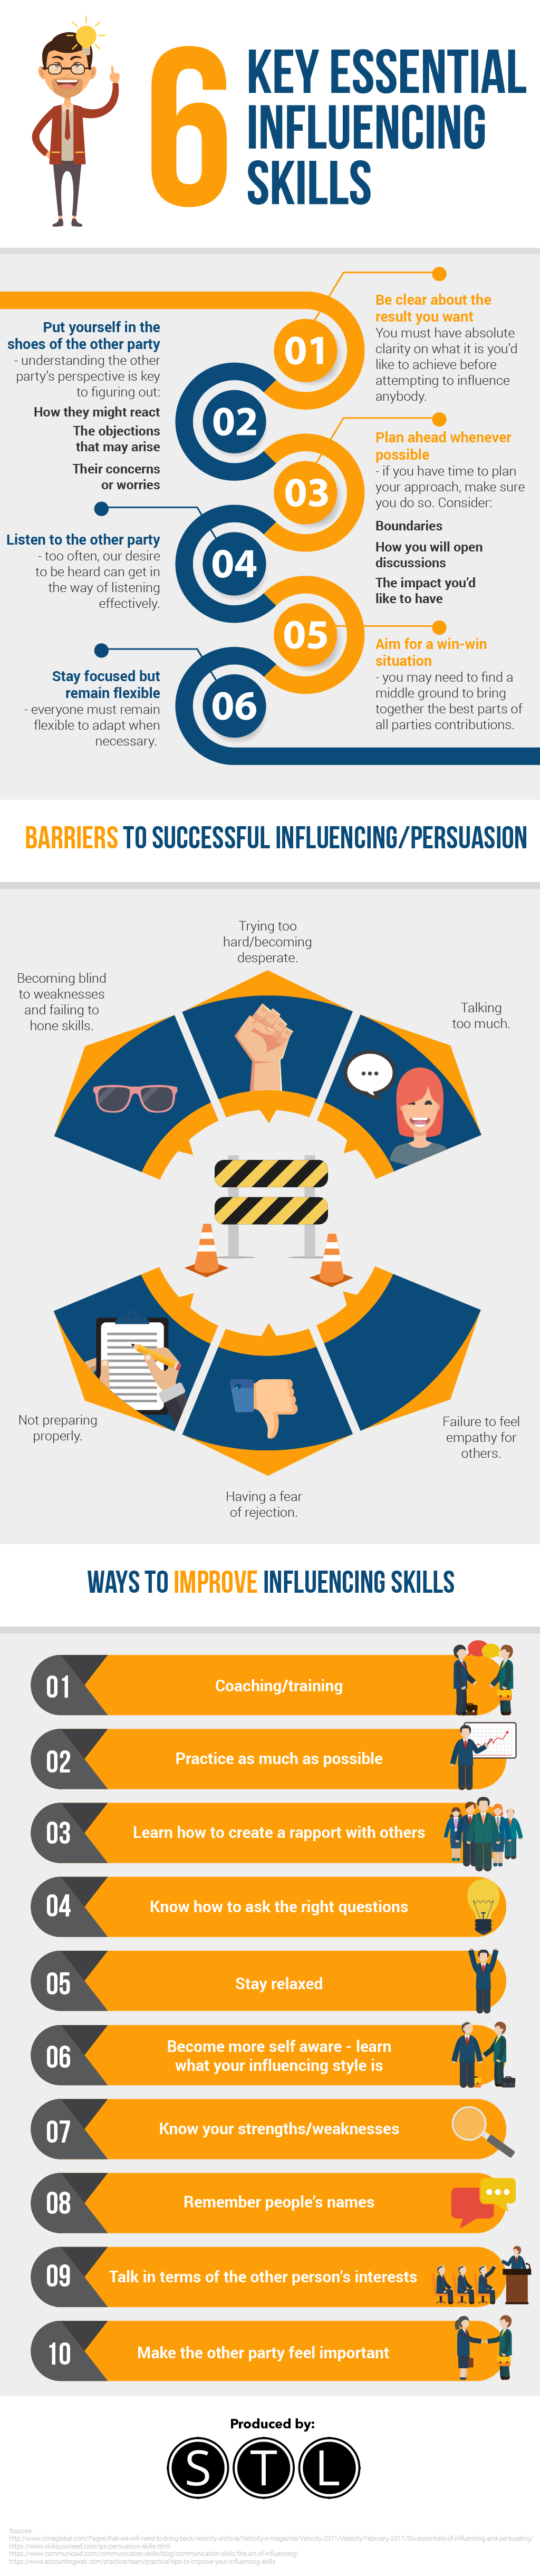 Six Key Essential Influencing Skills